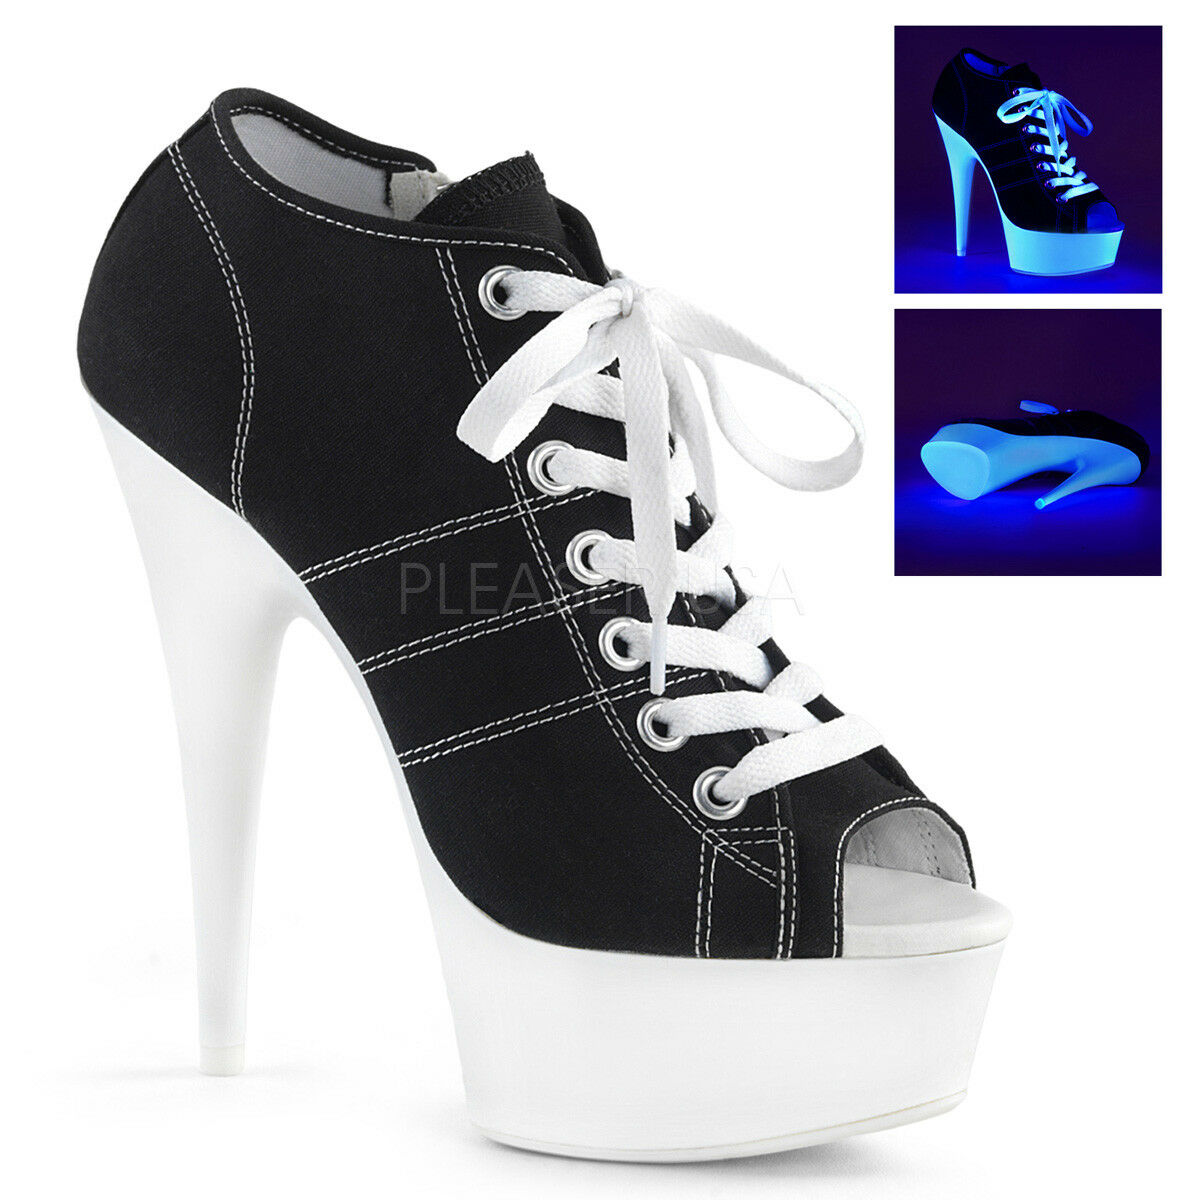 Pleaser DELIGHT-600SK-01 Wohombres negro Canvas Neon blanco Heels Platform botaie